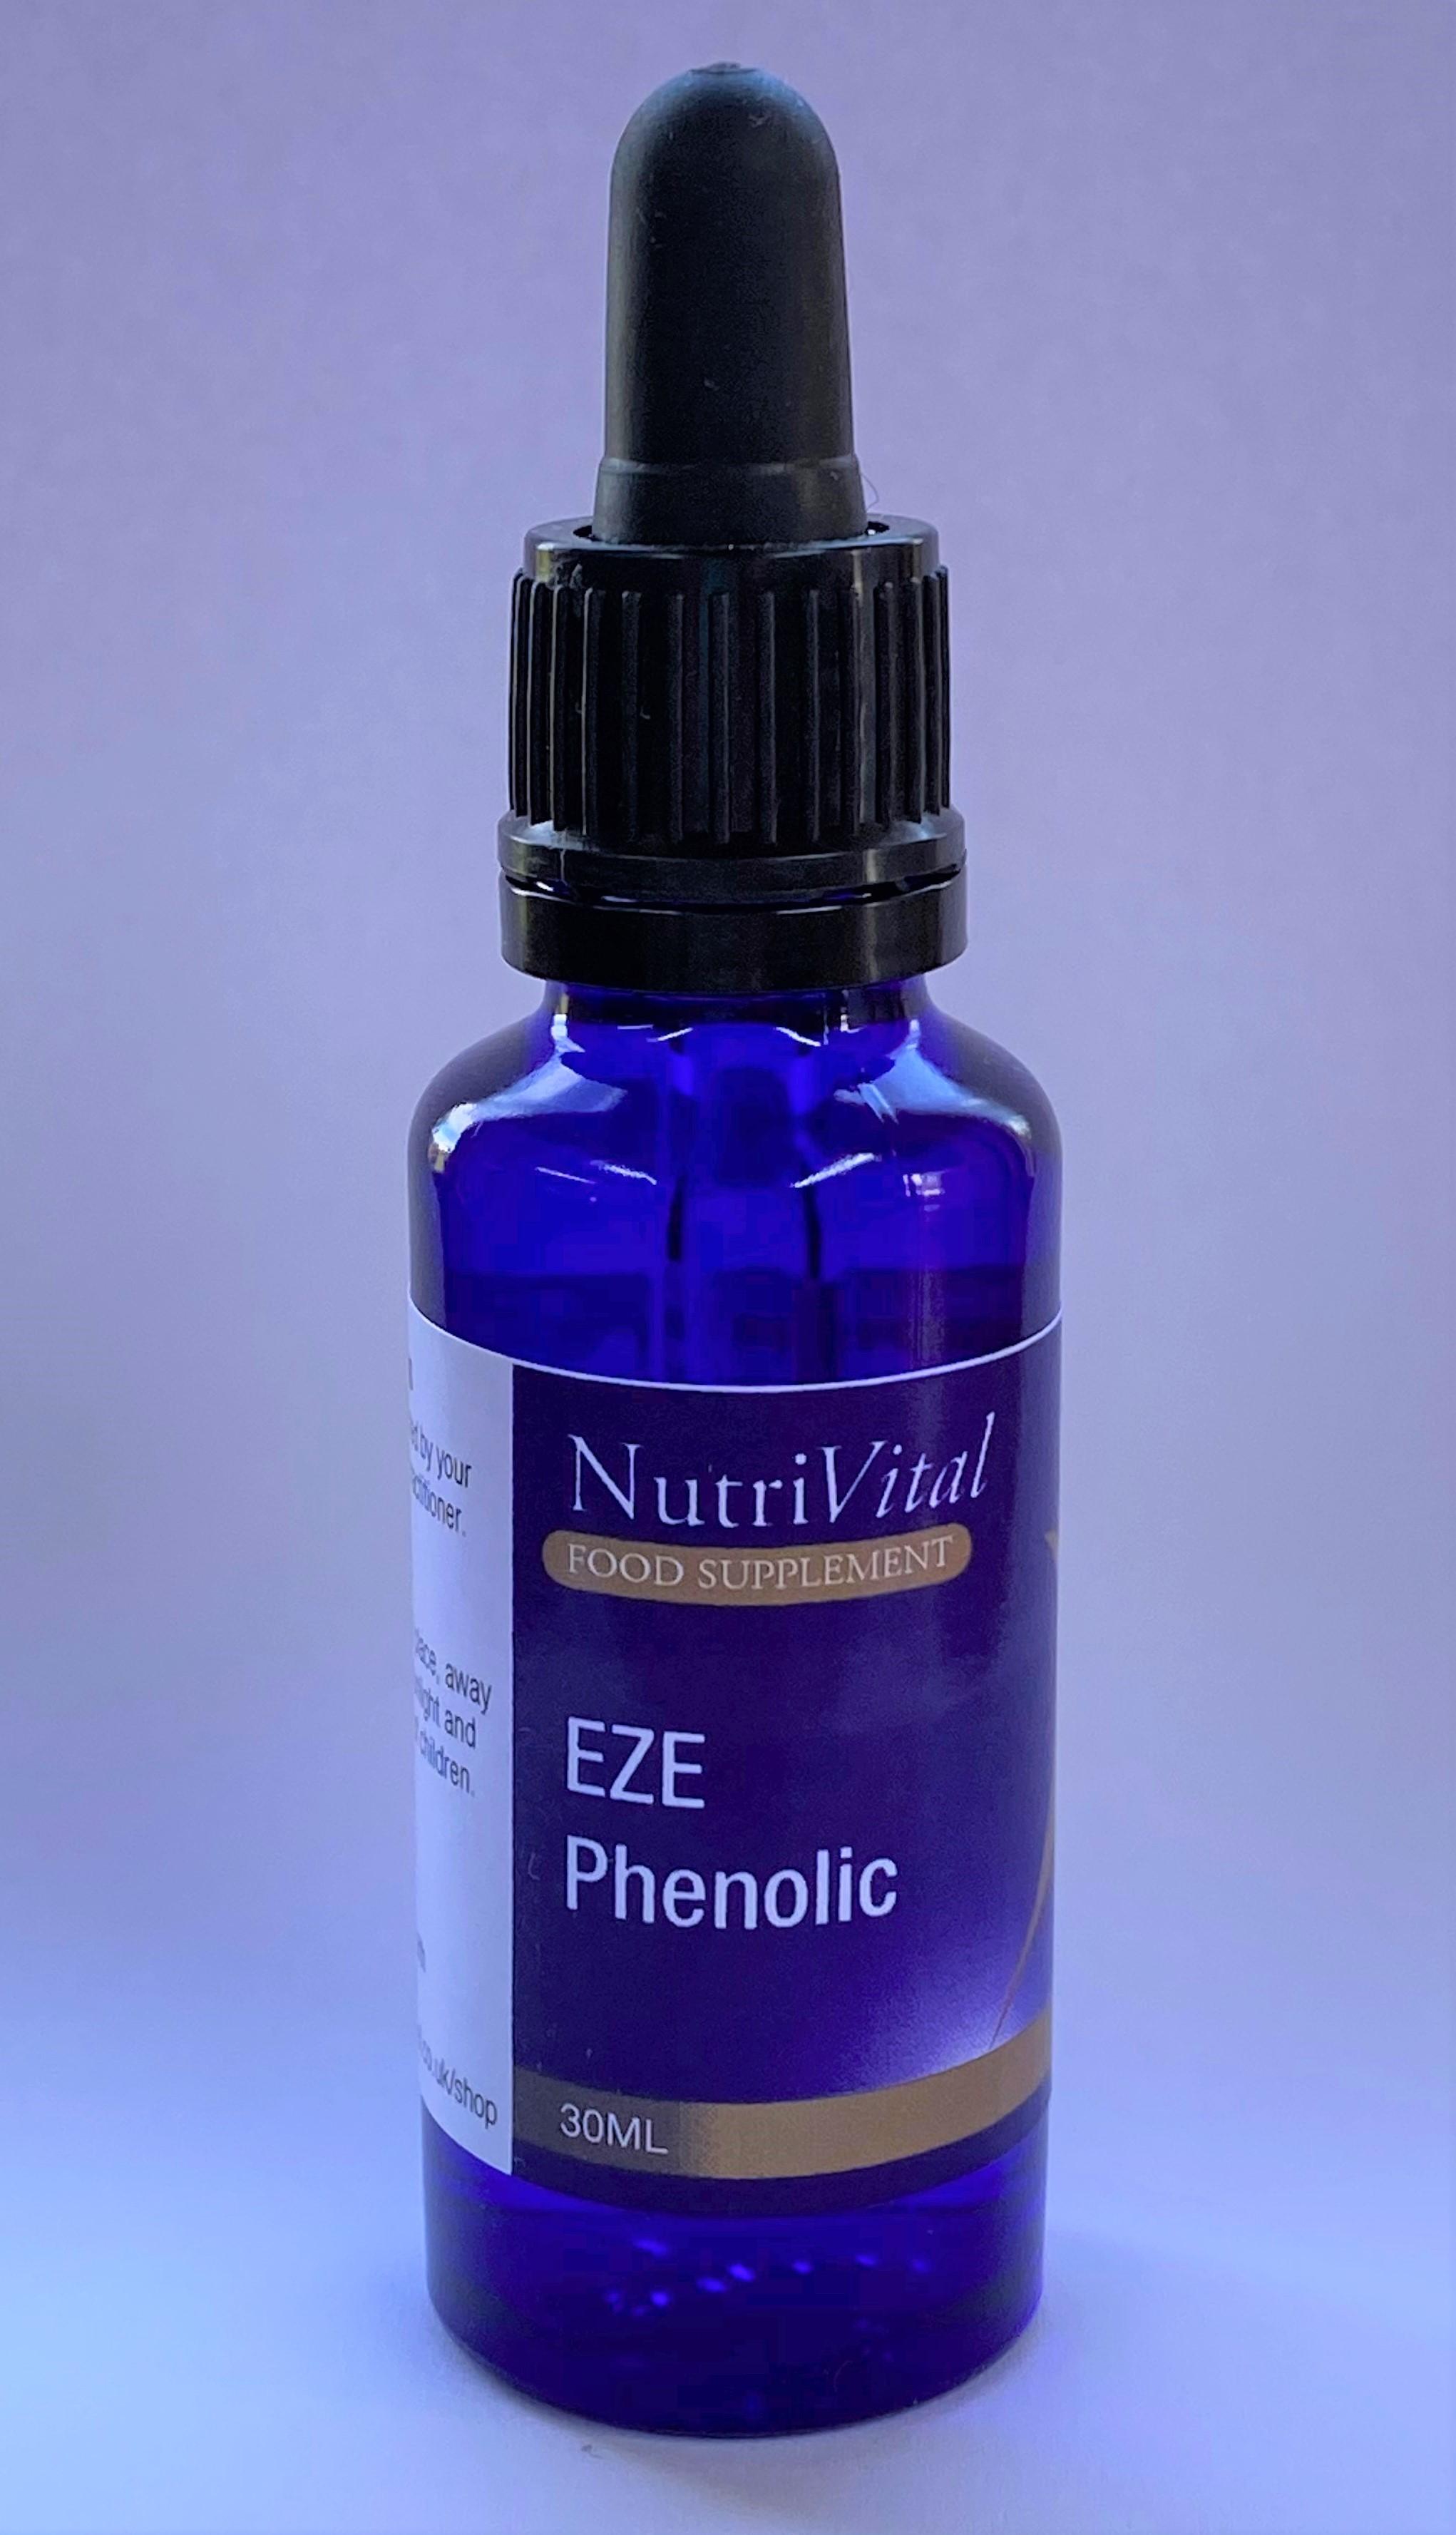 EZE Phenolic 30ml